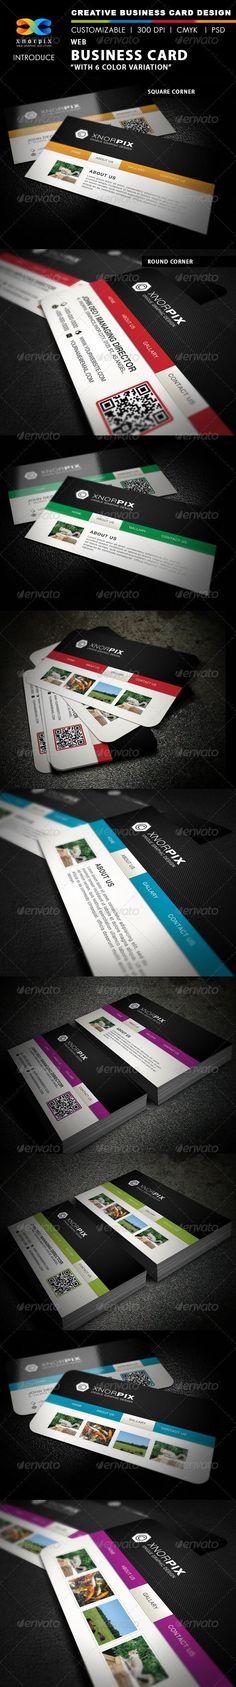 Web Business Card